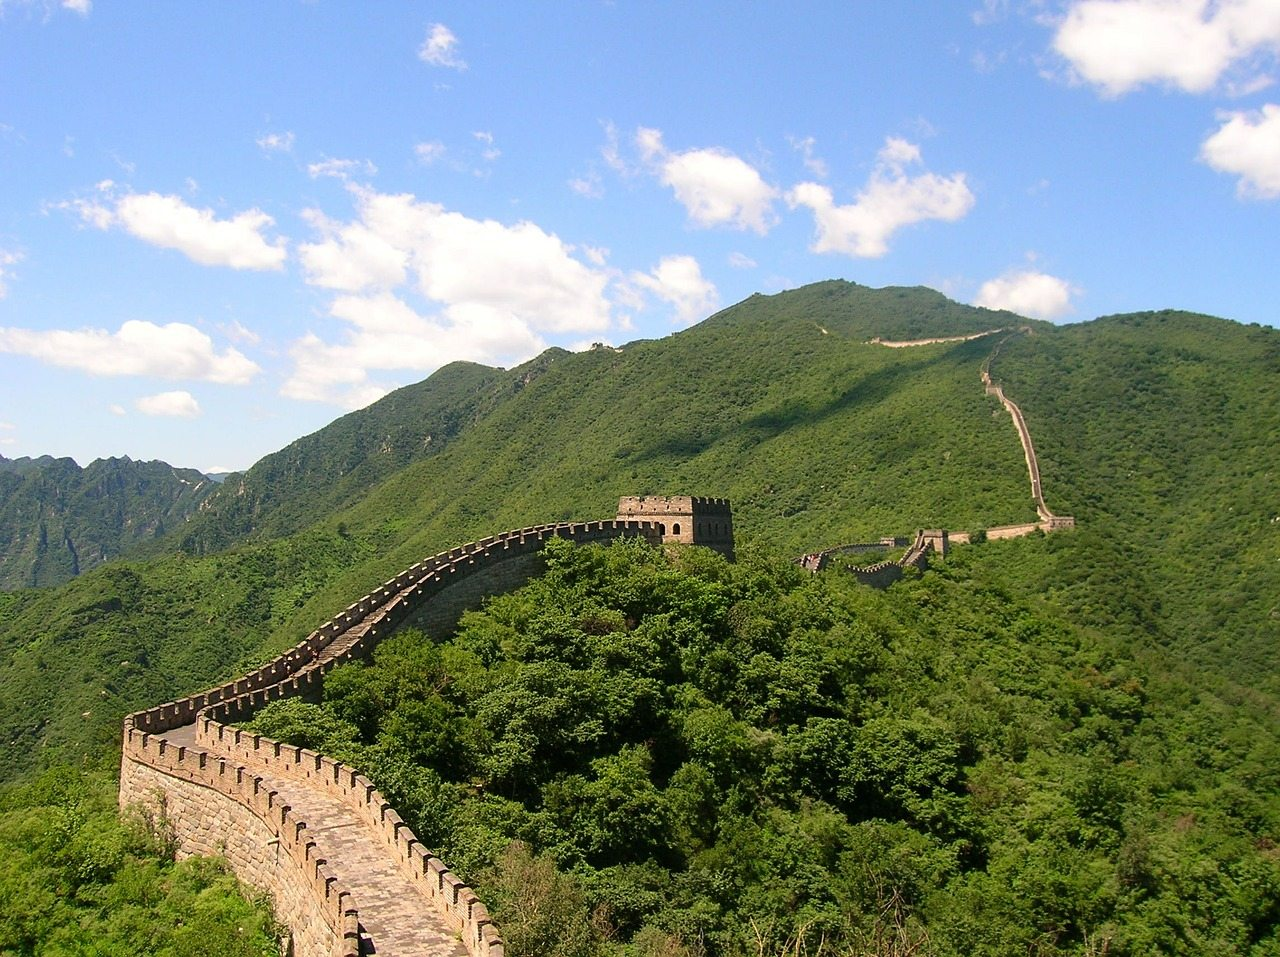 Muralla China cultural